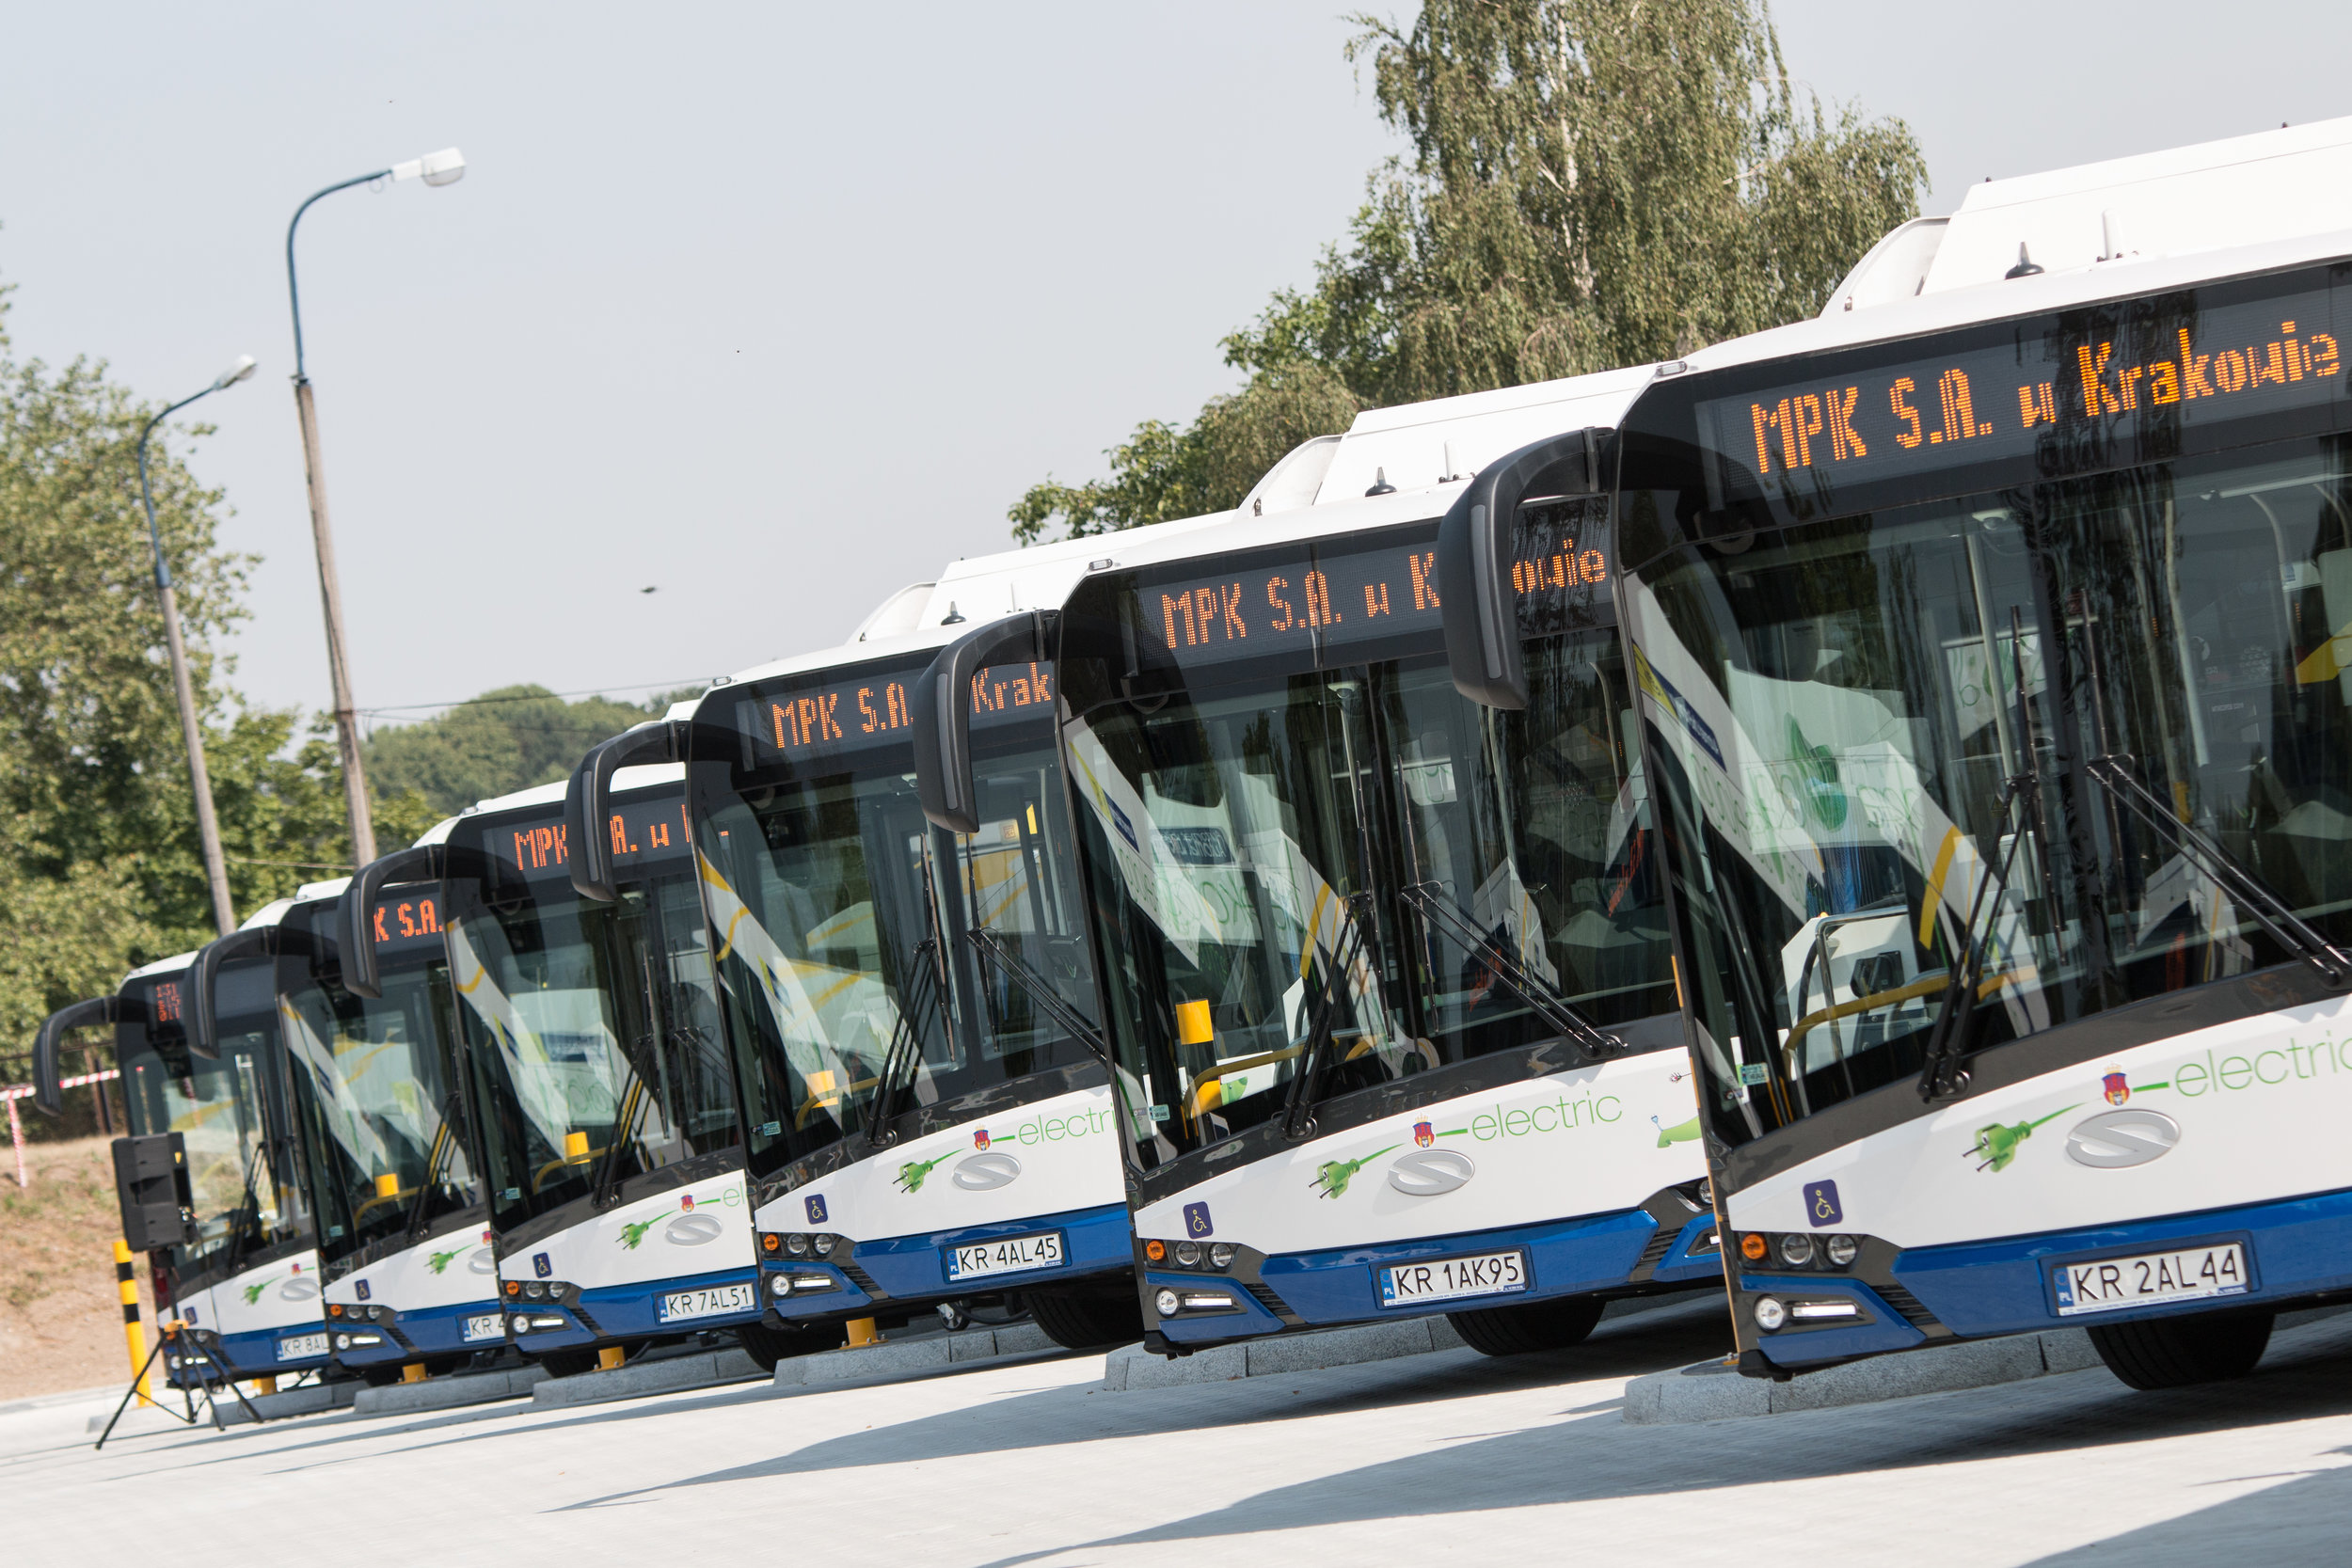 Nové elektrobusy pro Krakov. Celkem jich dopravce pořídil 20. (foto: Solaris Bus & Coach)